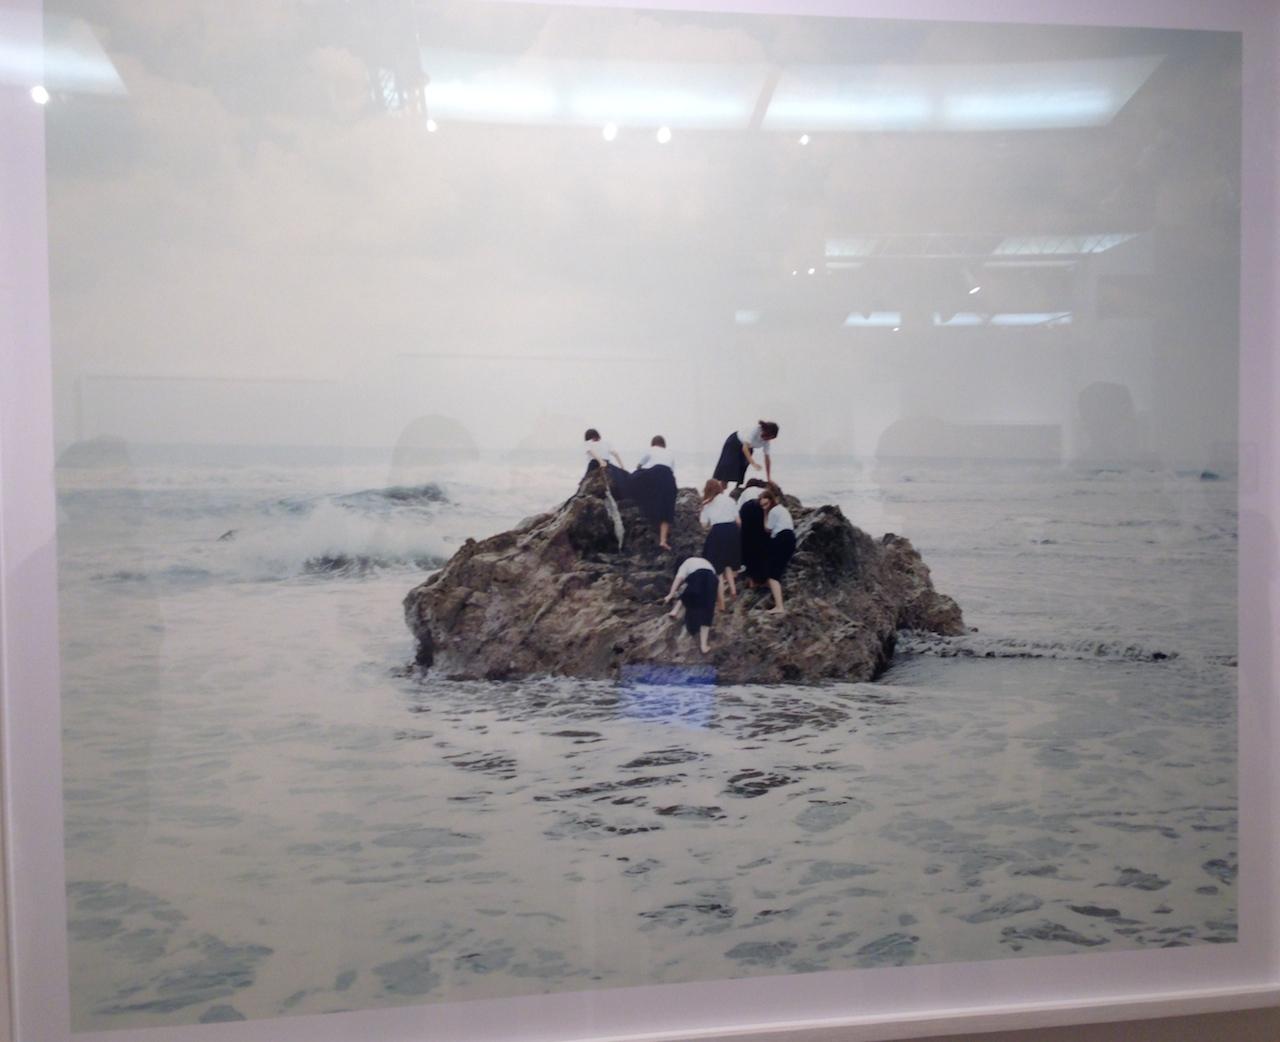 Osamu Yokonami, Assembly C-2, 2012. Archival pigment print: 41 x 49.5 inches. De Soto Gallery.